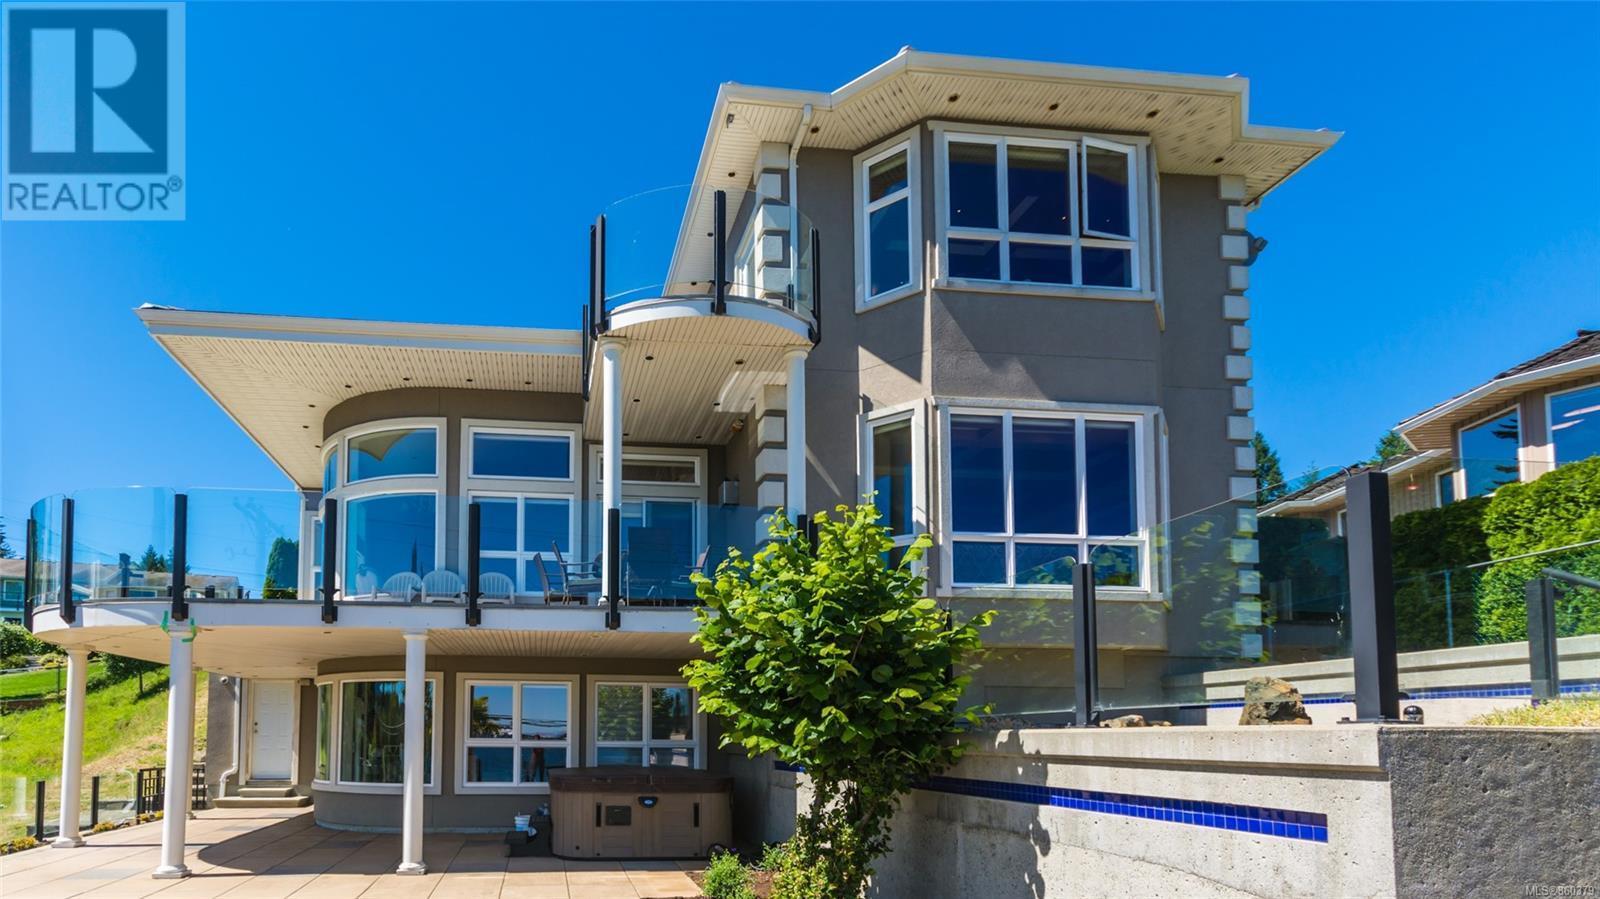 1326 Ivy Lane, Nanaimo, British Columbia  V9T 5T2 - Photo 48 - 860379